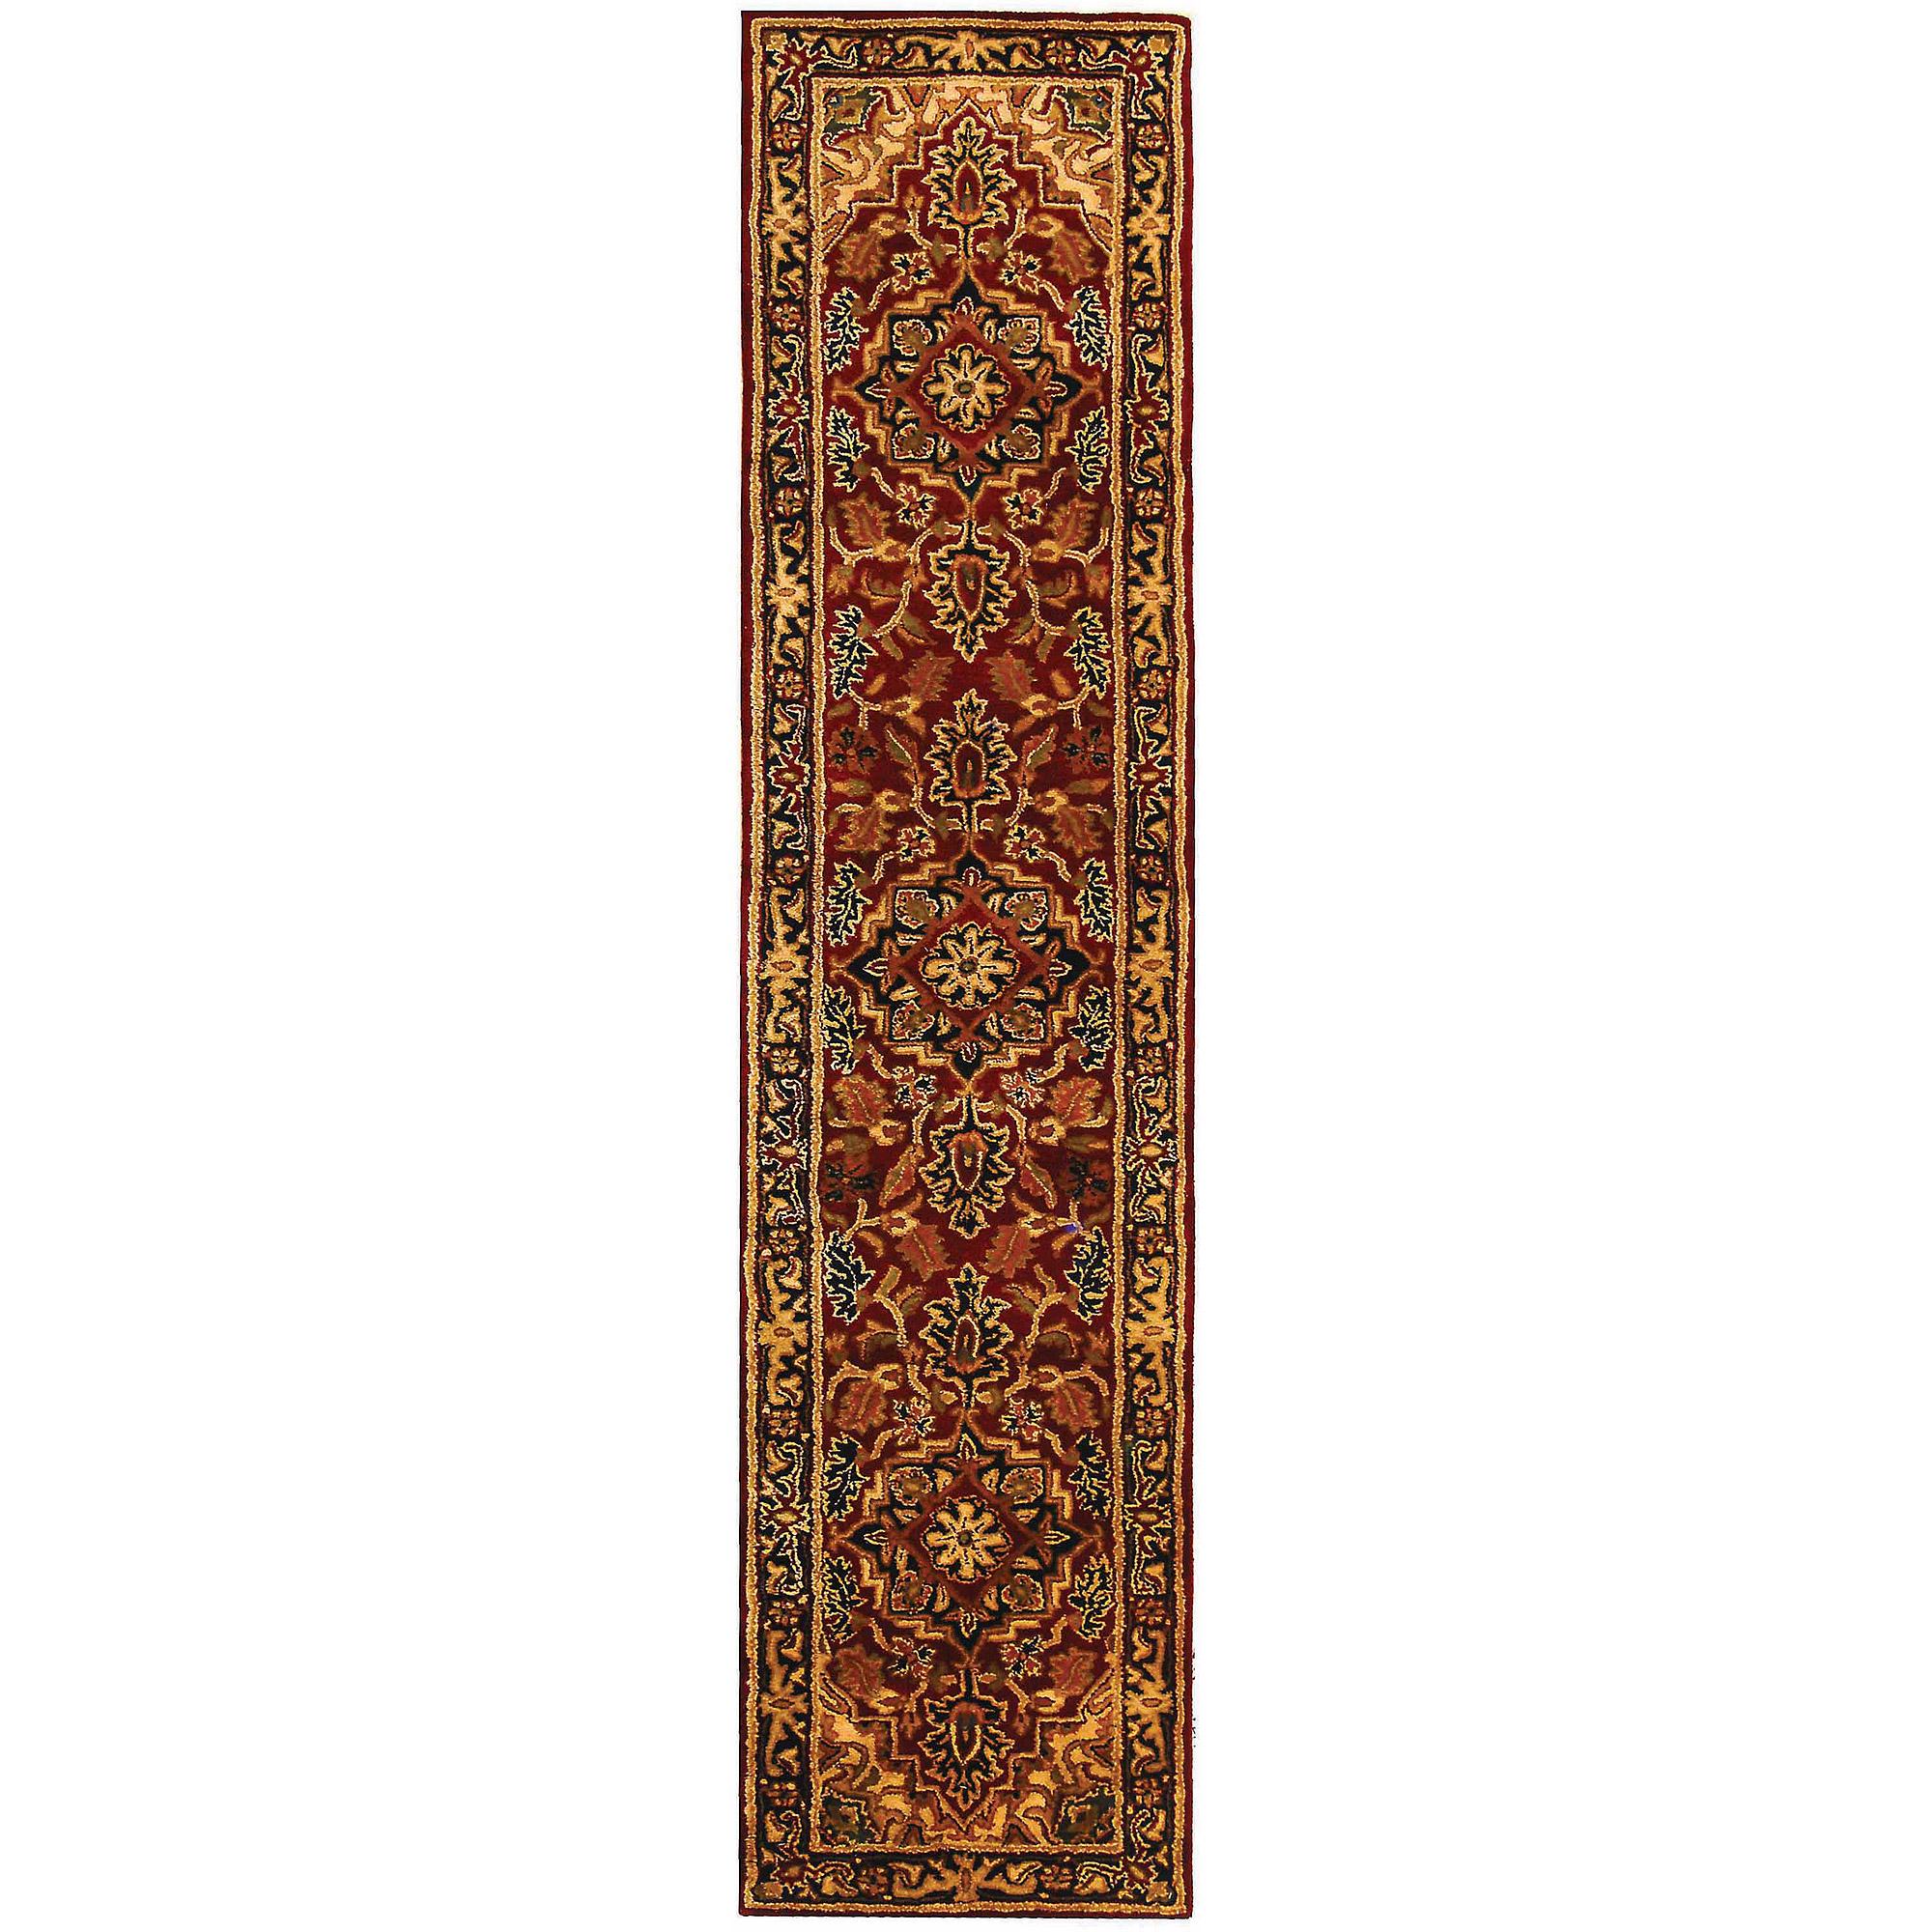 Safavieh Classic George Tufted Wool Runner Rug